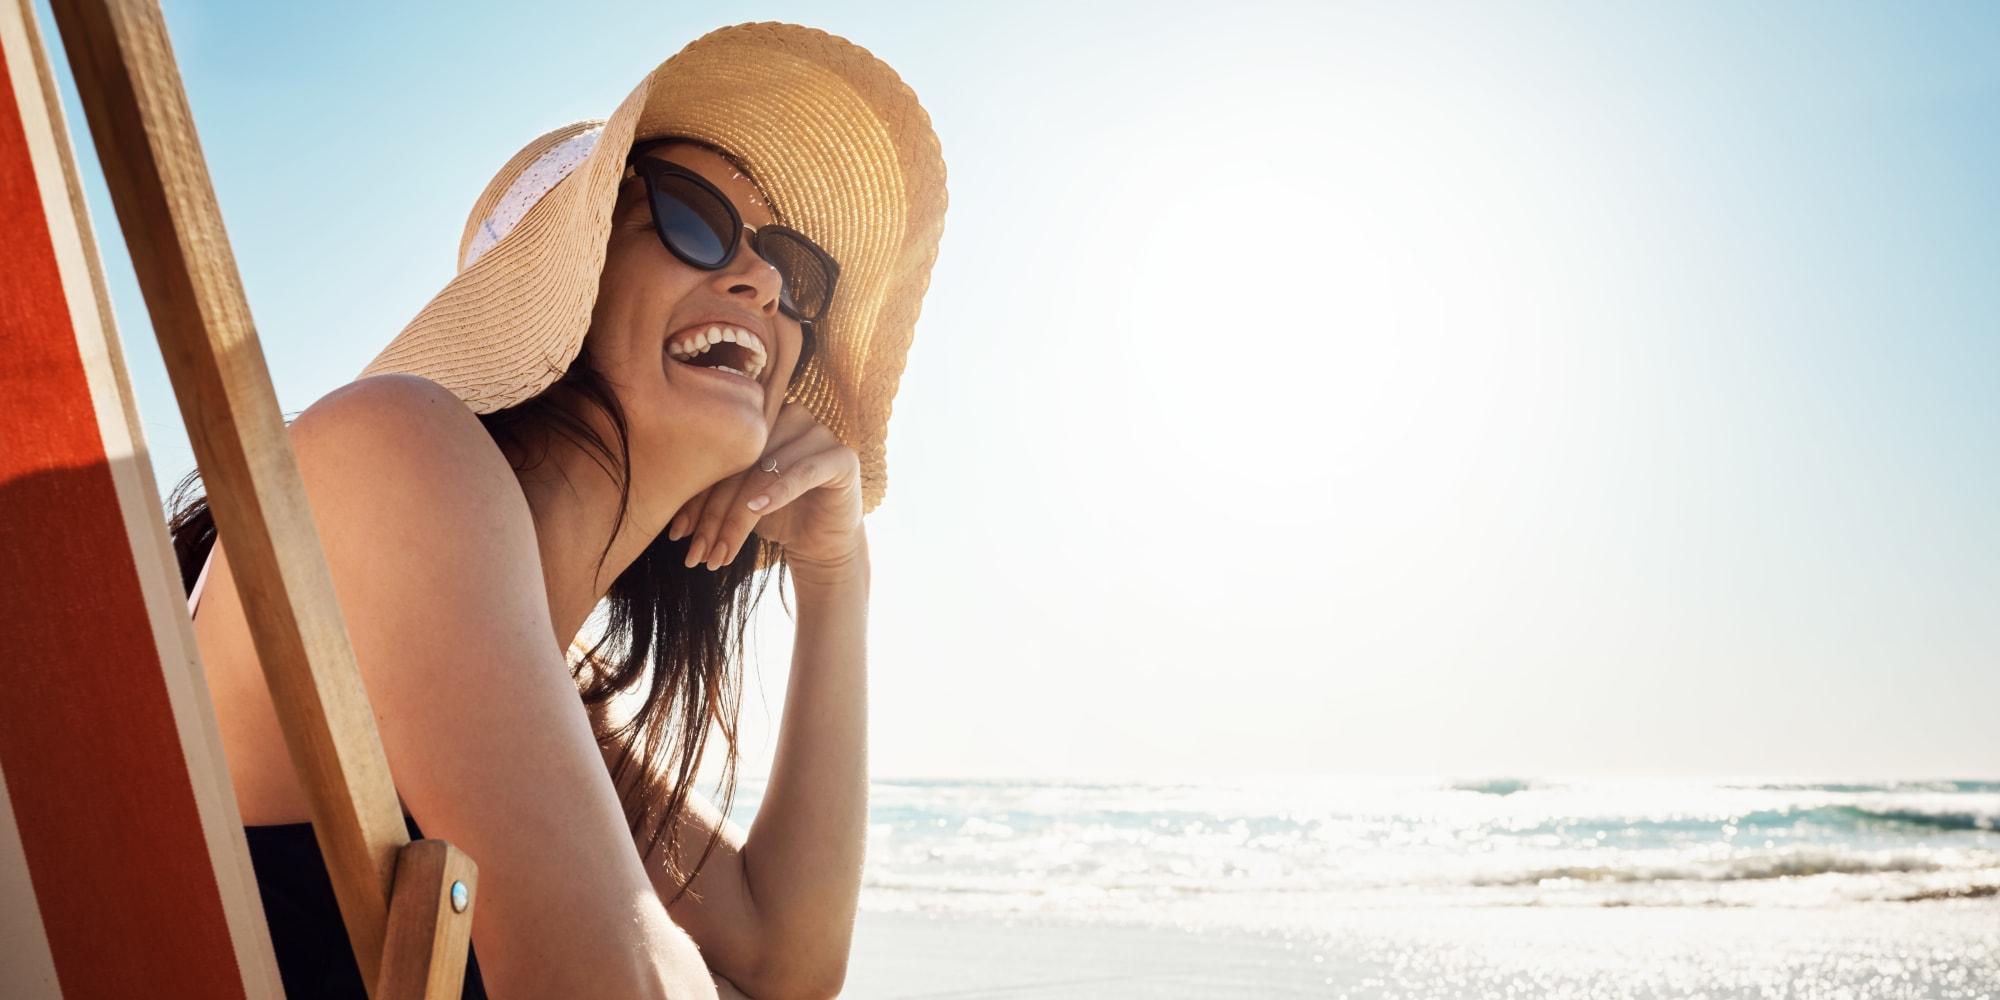 Woman enjoying the Florida coast